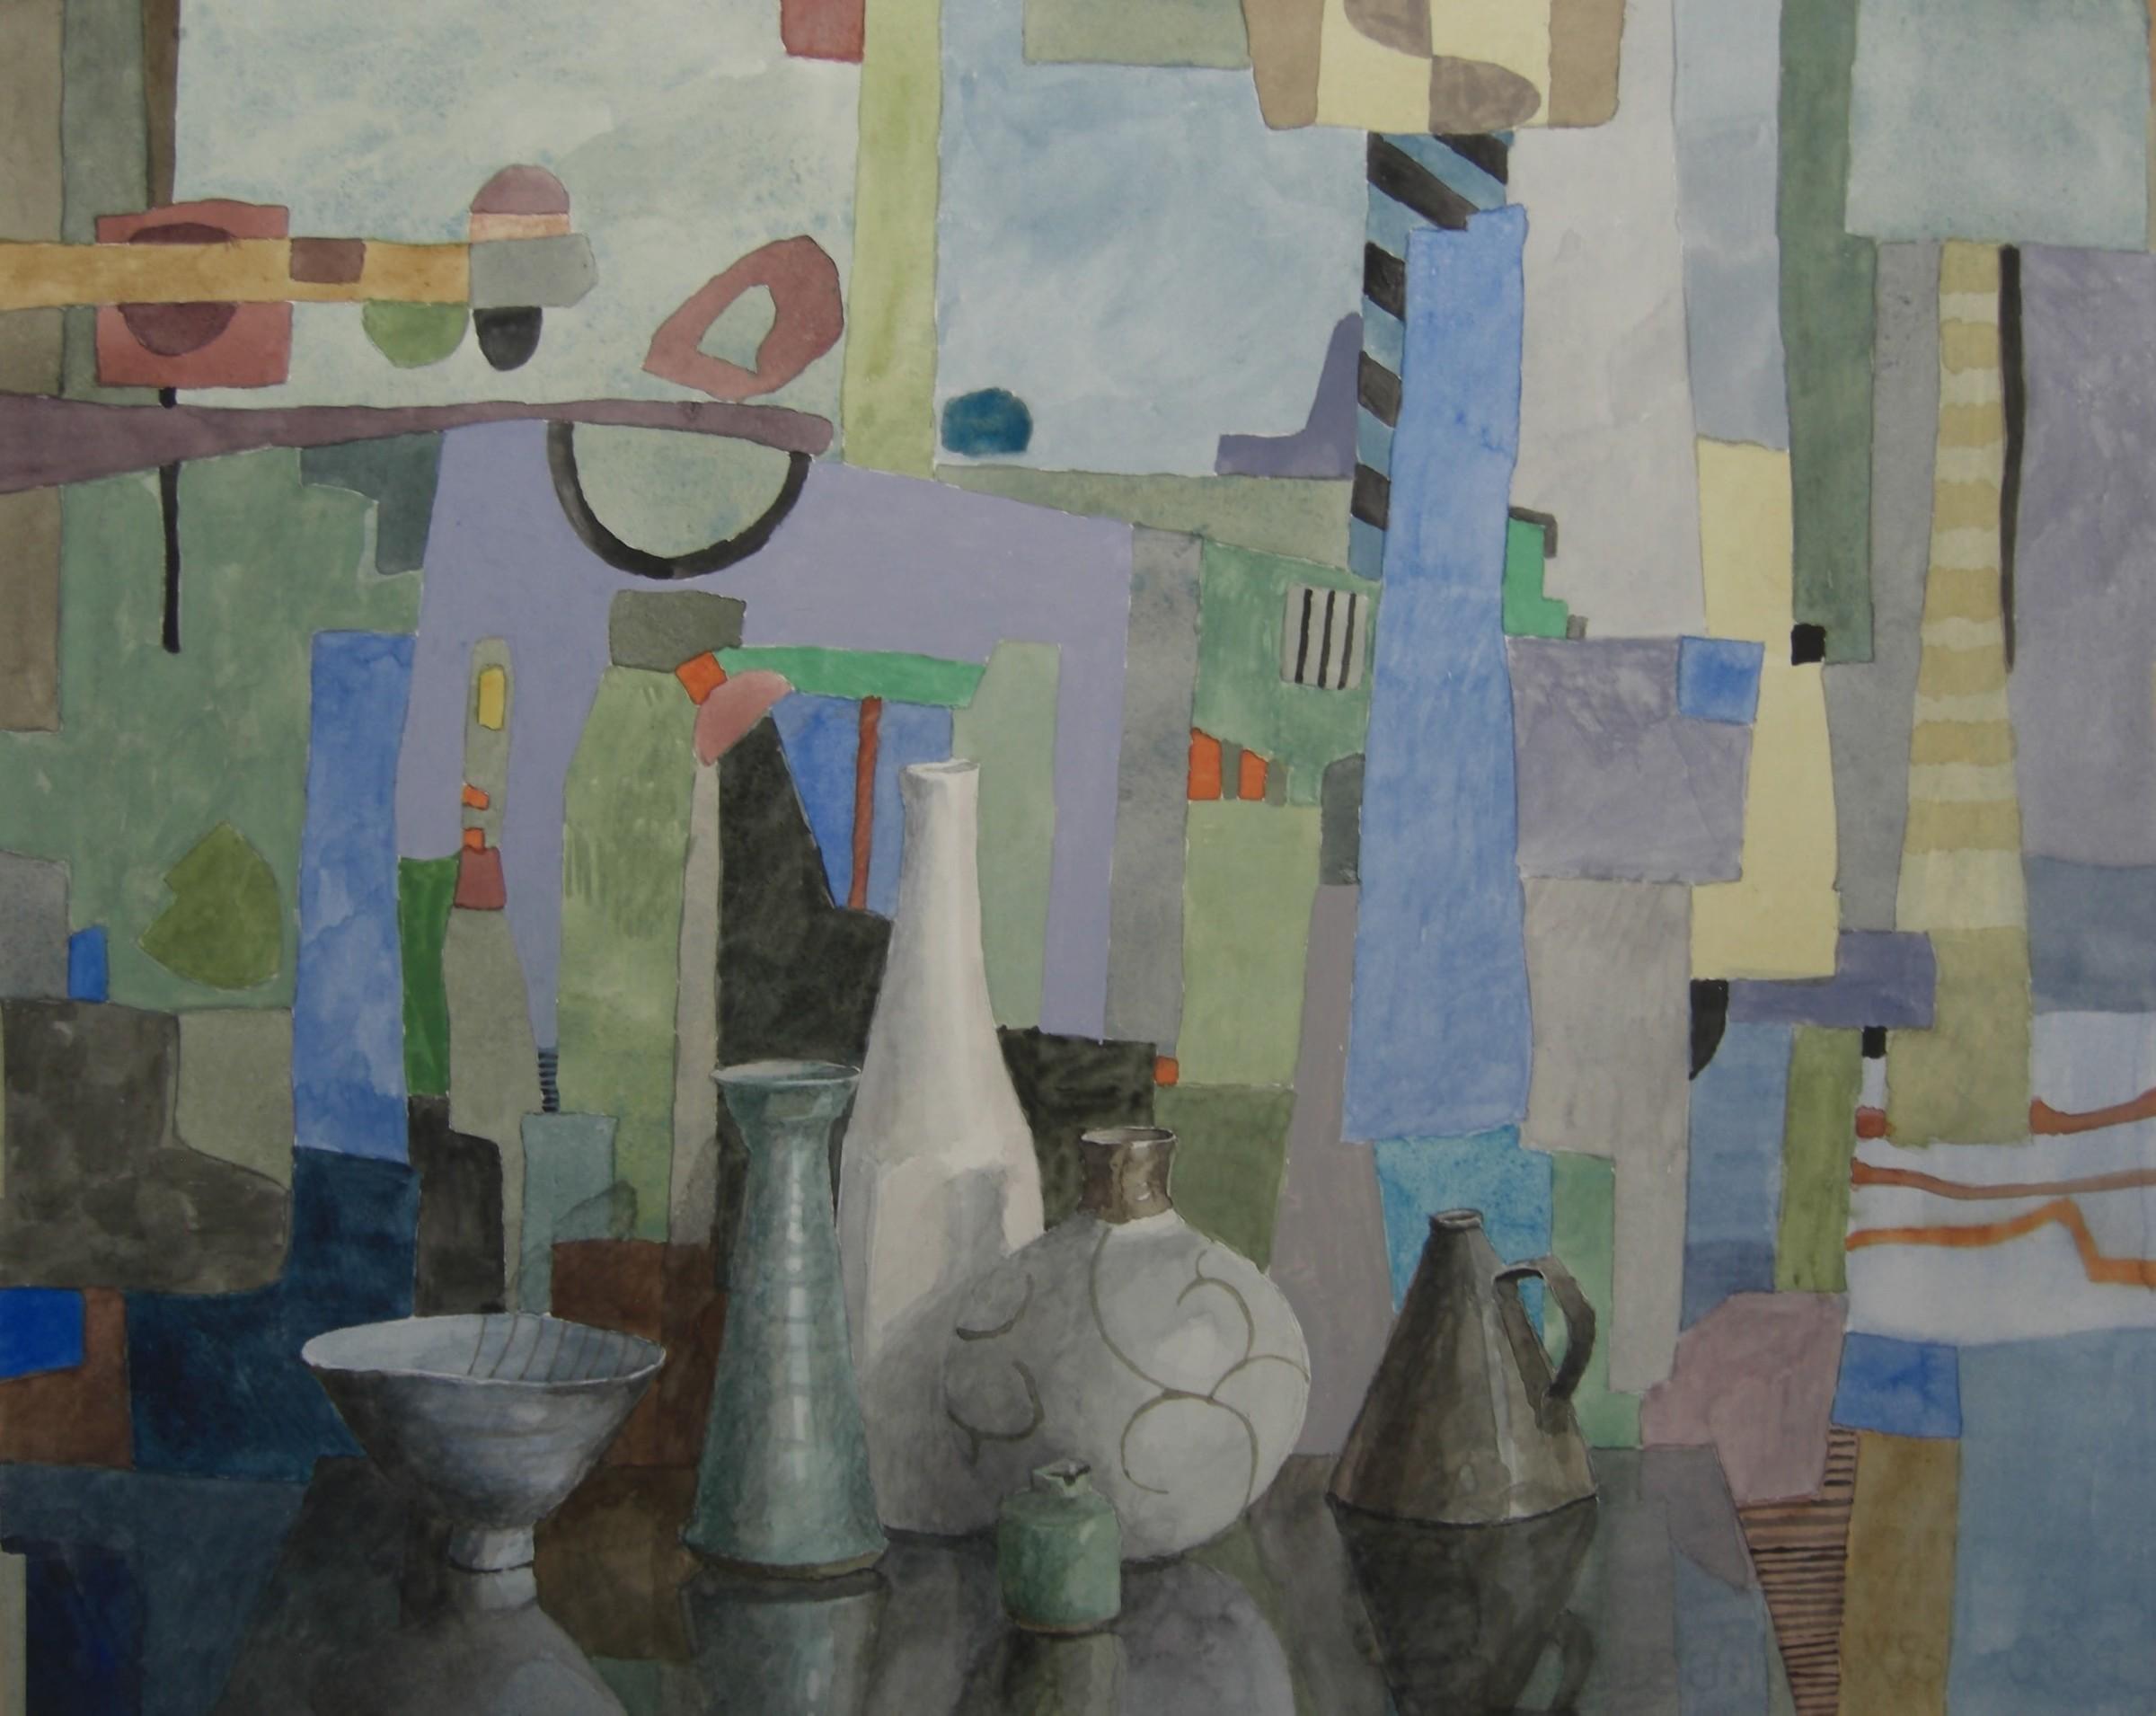 "<span class=""link fancybox-details-link""><a href=""/artists/109-annie-williams/works/12186-annie-williams-patchwork-in-blue/"">View Detail Page</a></span><div class=""artist""><span class=""artist""><strong>Annie Williams</strong></span></div><div class=""title""><em>Patchwork in Blue</em></div><div class=""medium"">watercolour</div><div class=""dimensions"">Frame: 58 x 67 cm<br /> Artwork: 40 x 50 cm</div><div class=""price"">£800.00</div>"